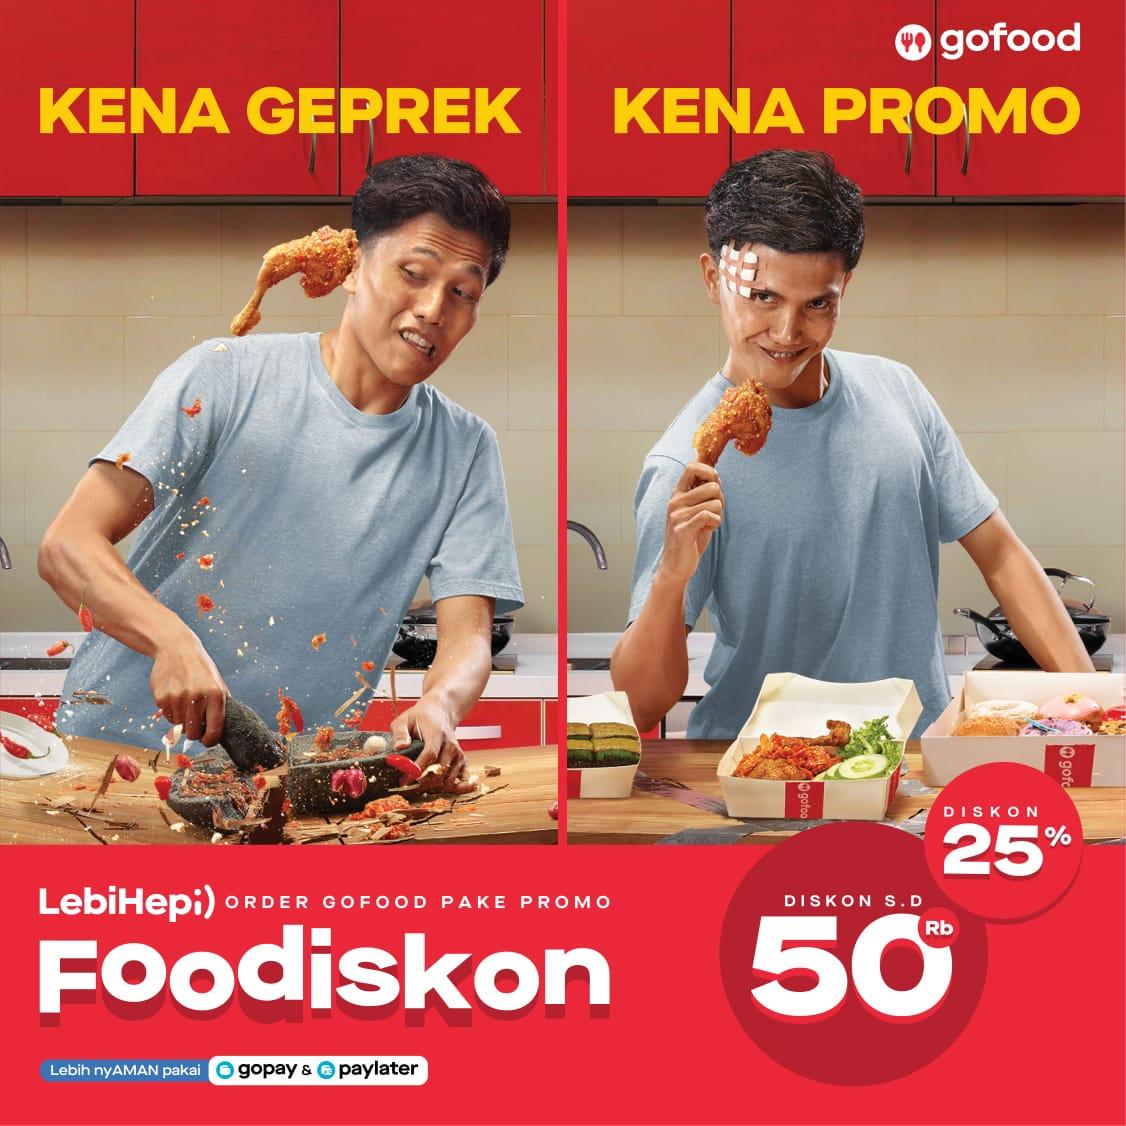 Gofood Berikan Diskon Harga Lewat Promo Foodiskon Padek Co